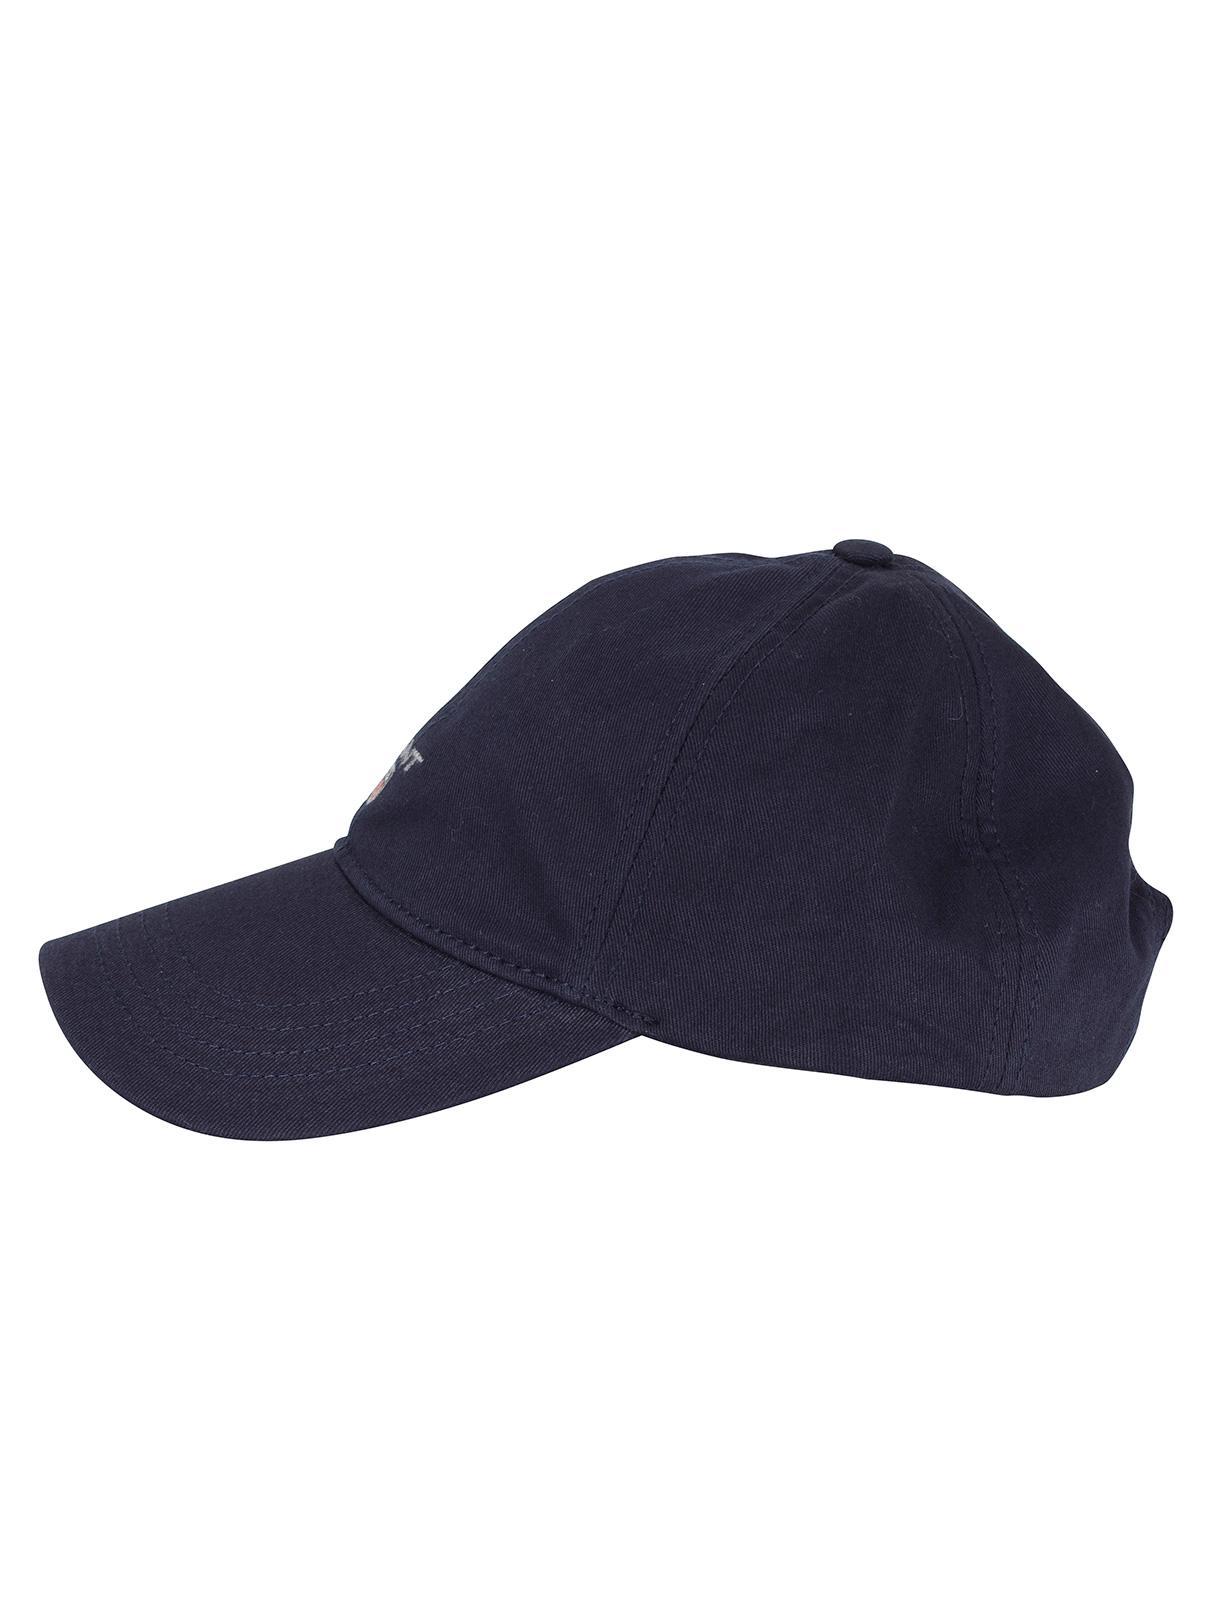 999e6352155 GANT Marine Twill Logo Cap in Blue for Men - Lyst